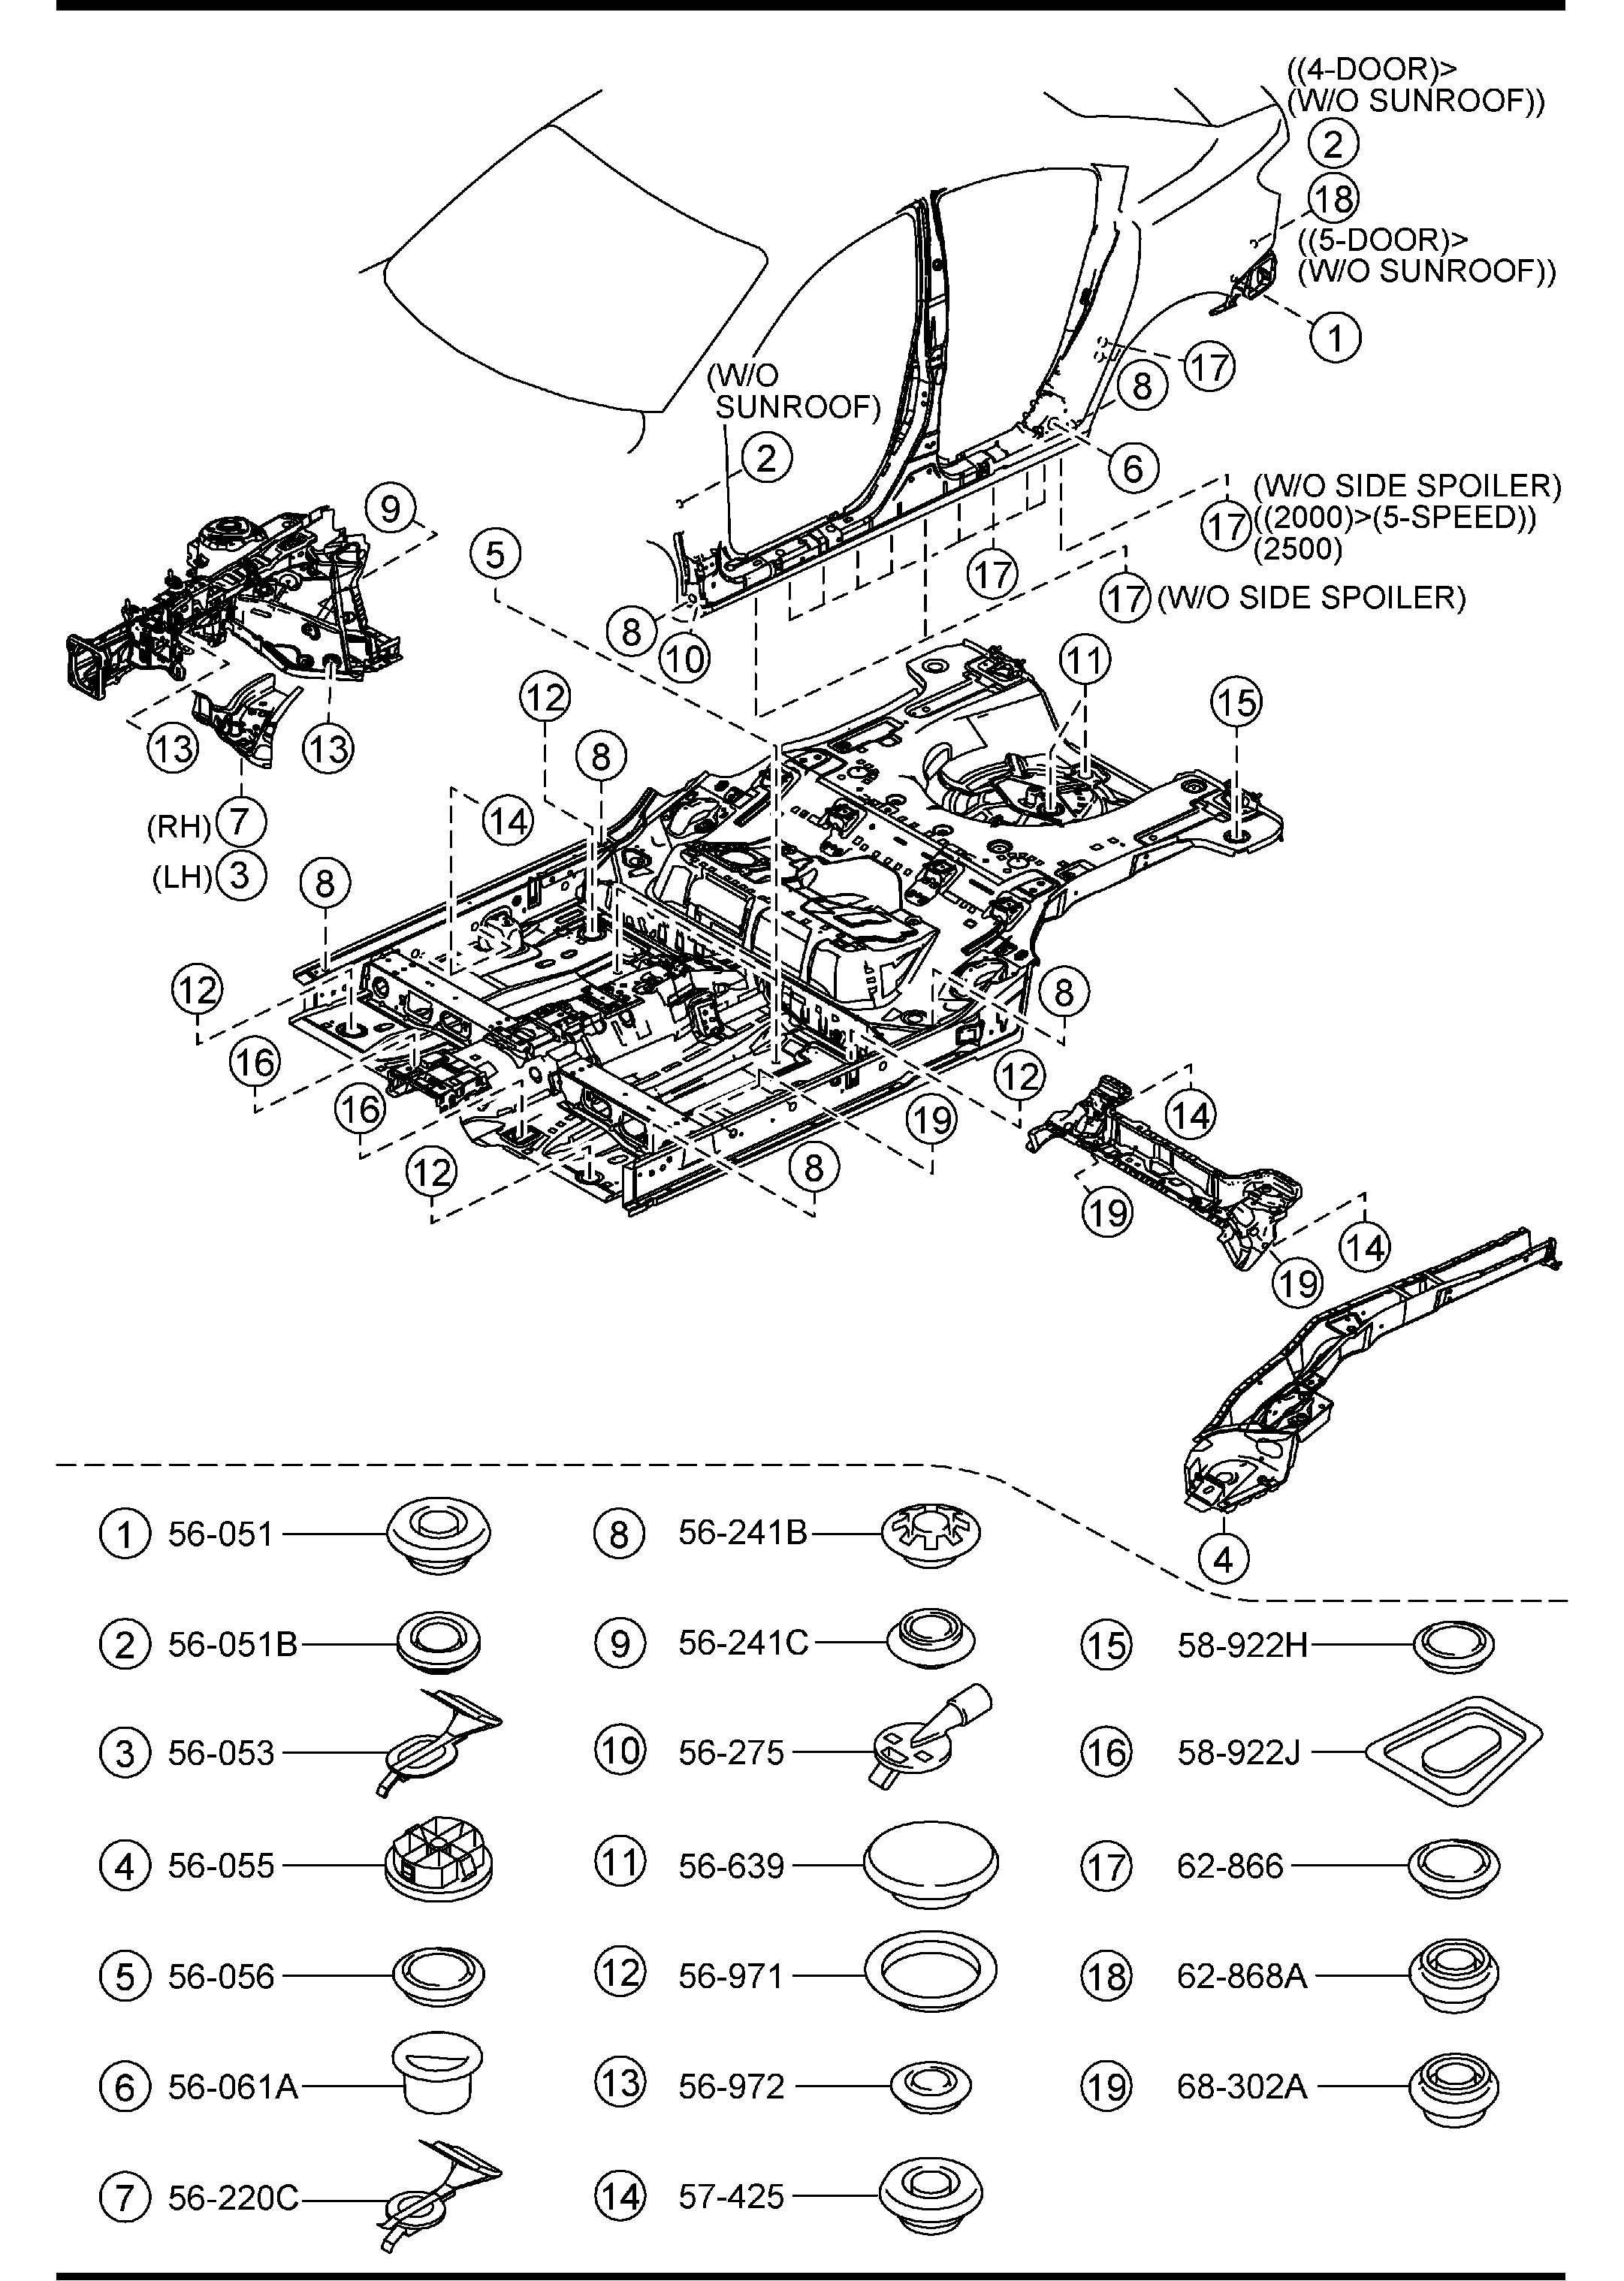 Mazda Mazda 3 Cover Hole Covers